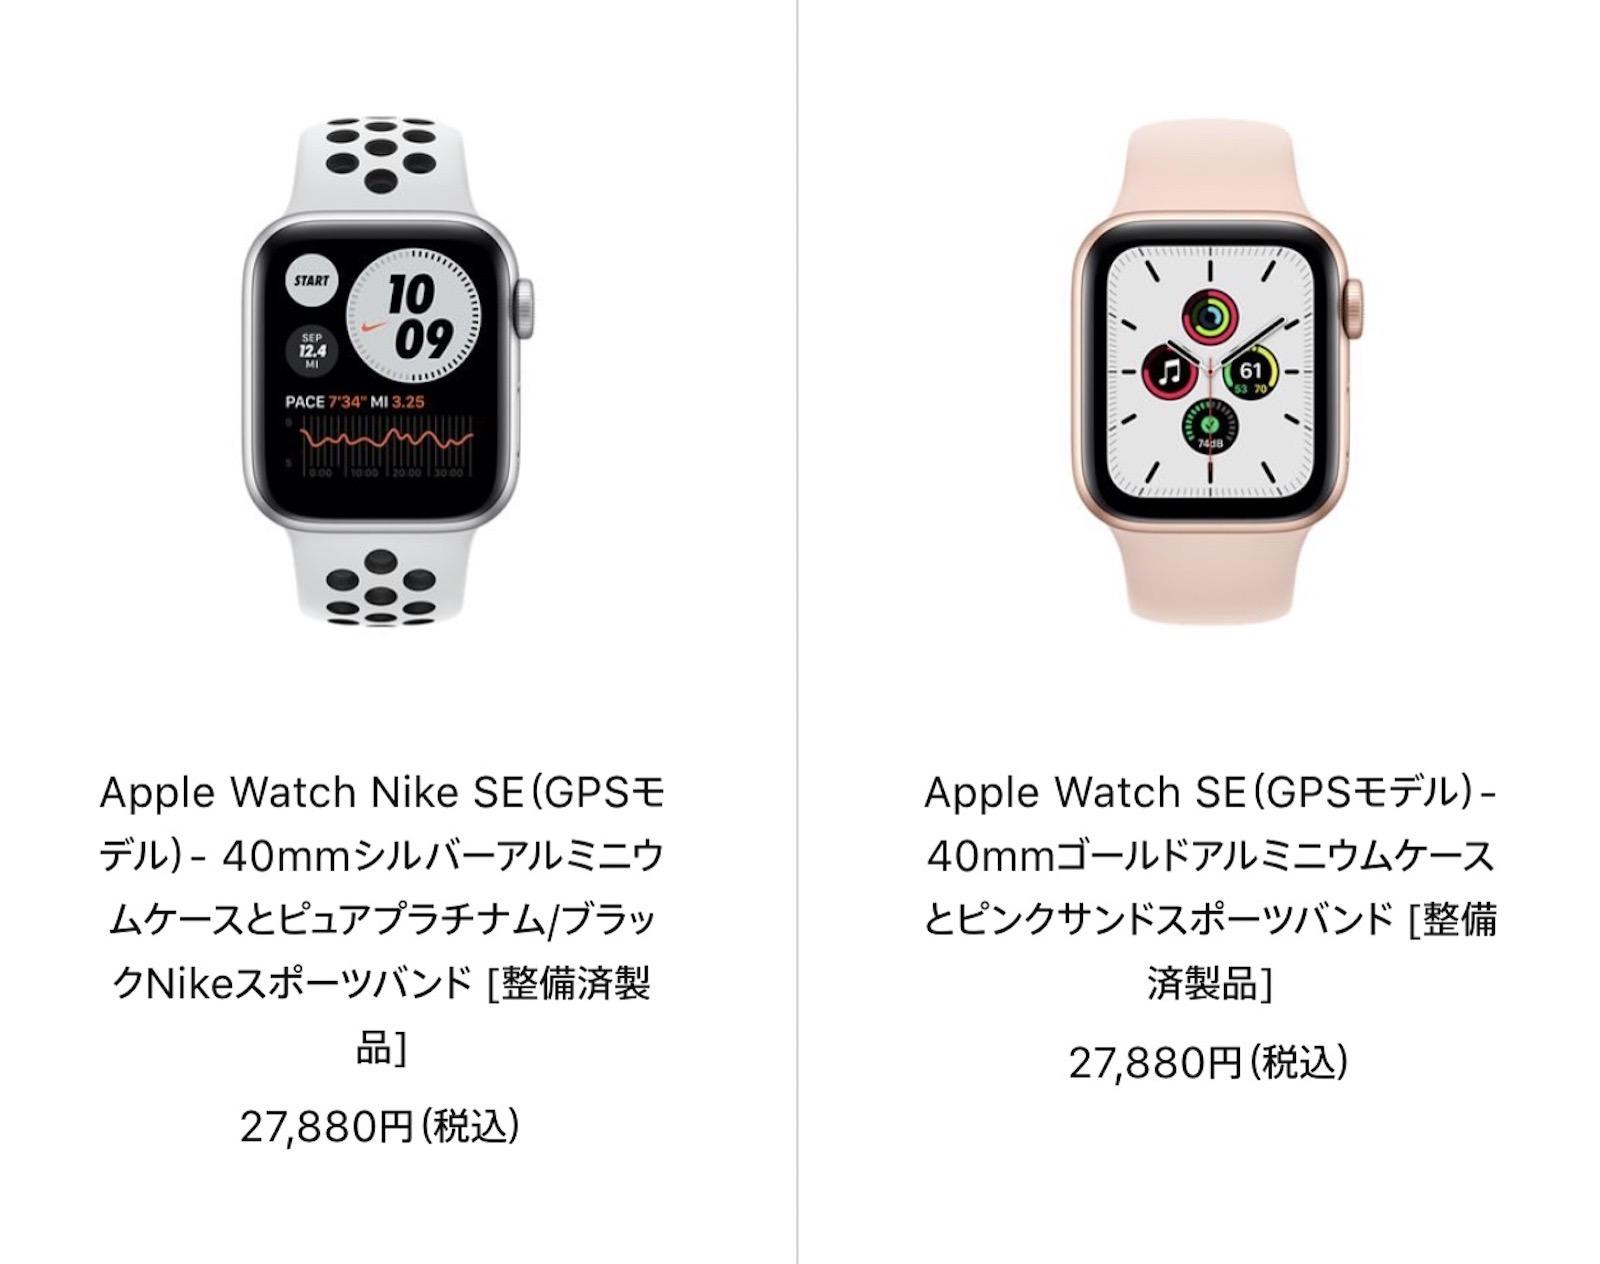 AppleWatch Refurbished model 2021 08 25